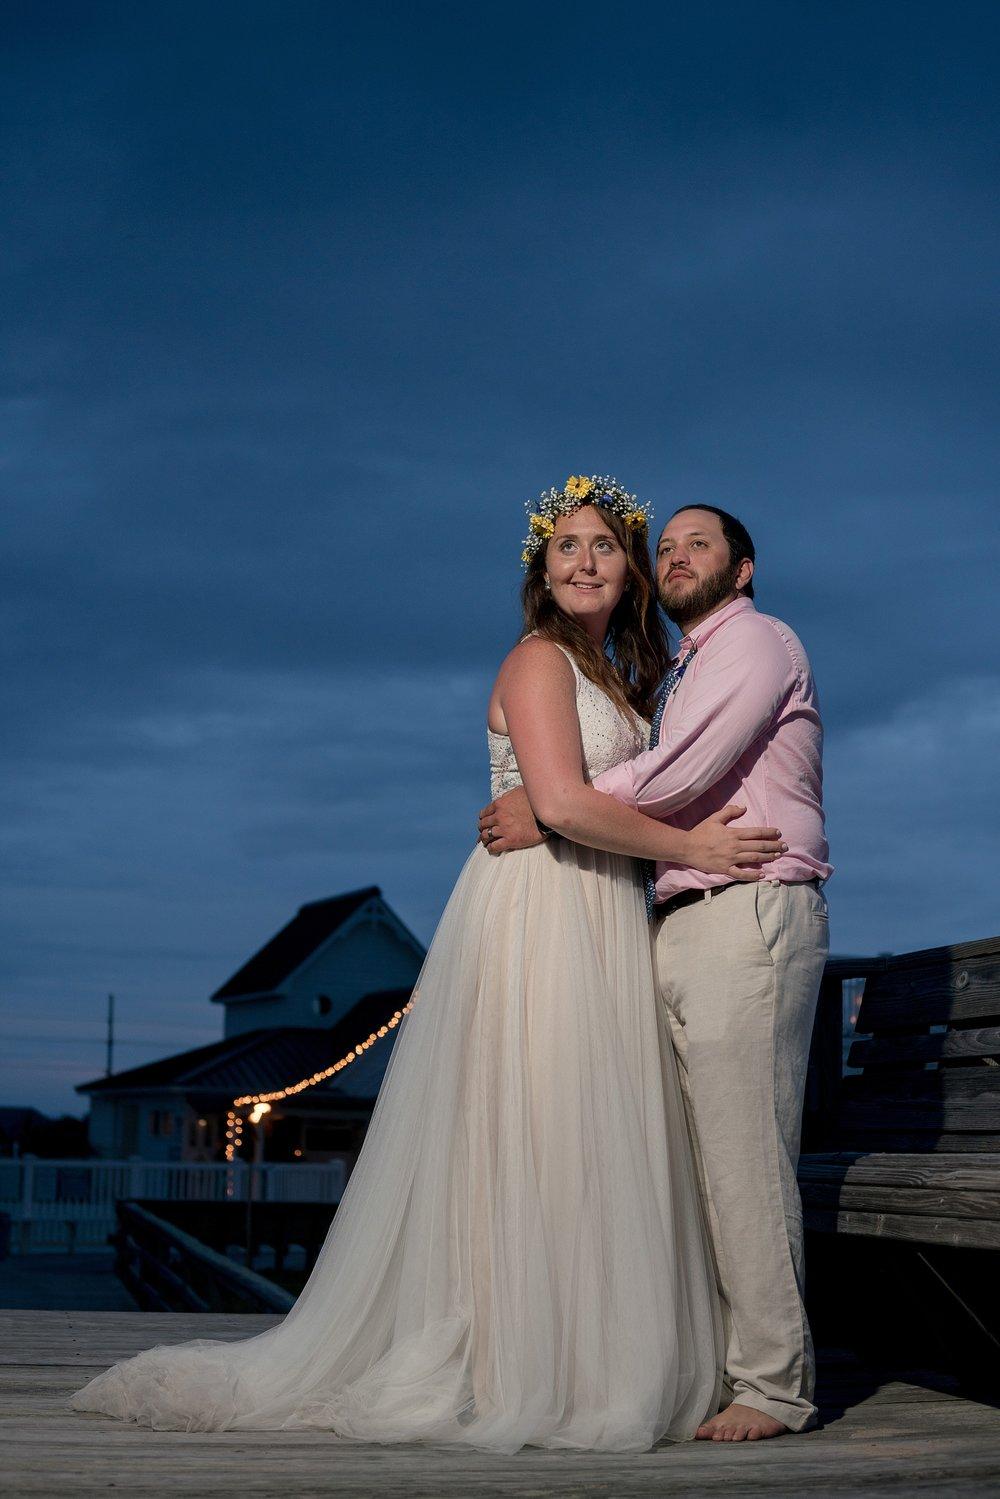 Avon-NC-Wedding-Photographer-223.jpg